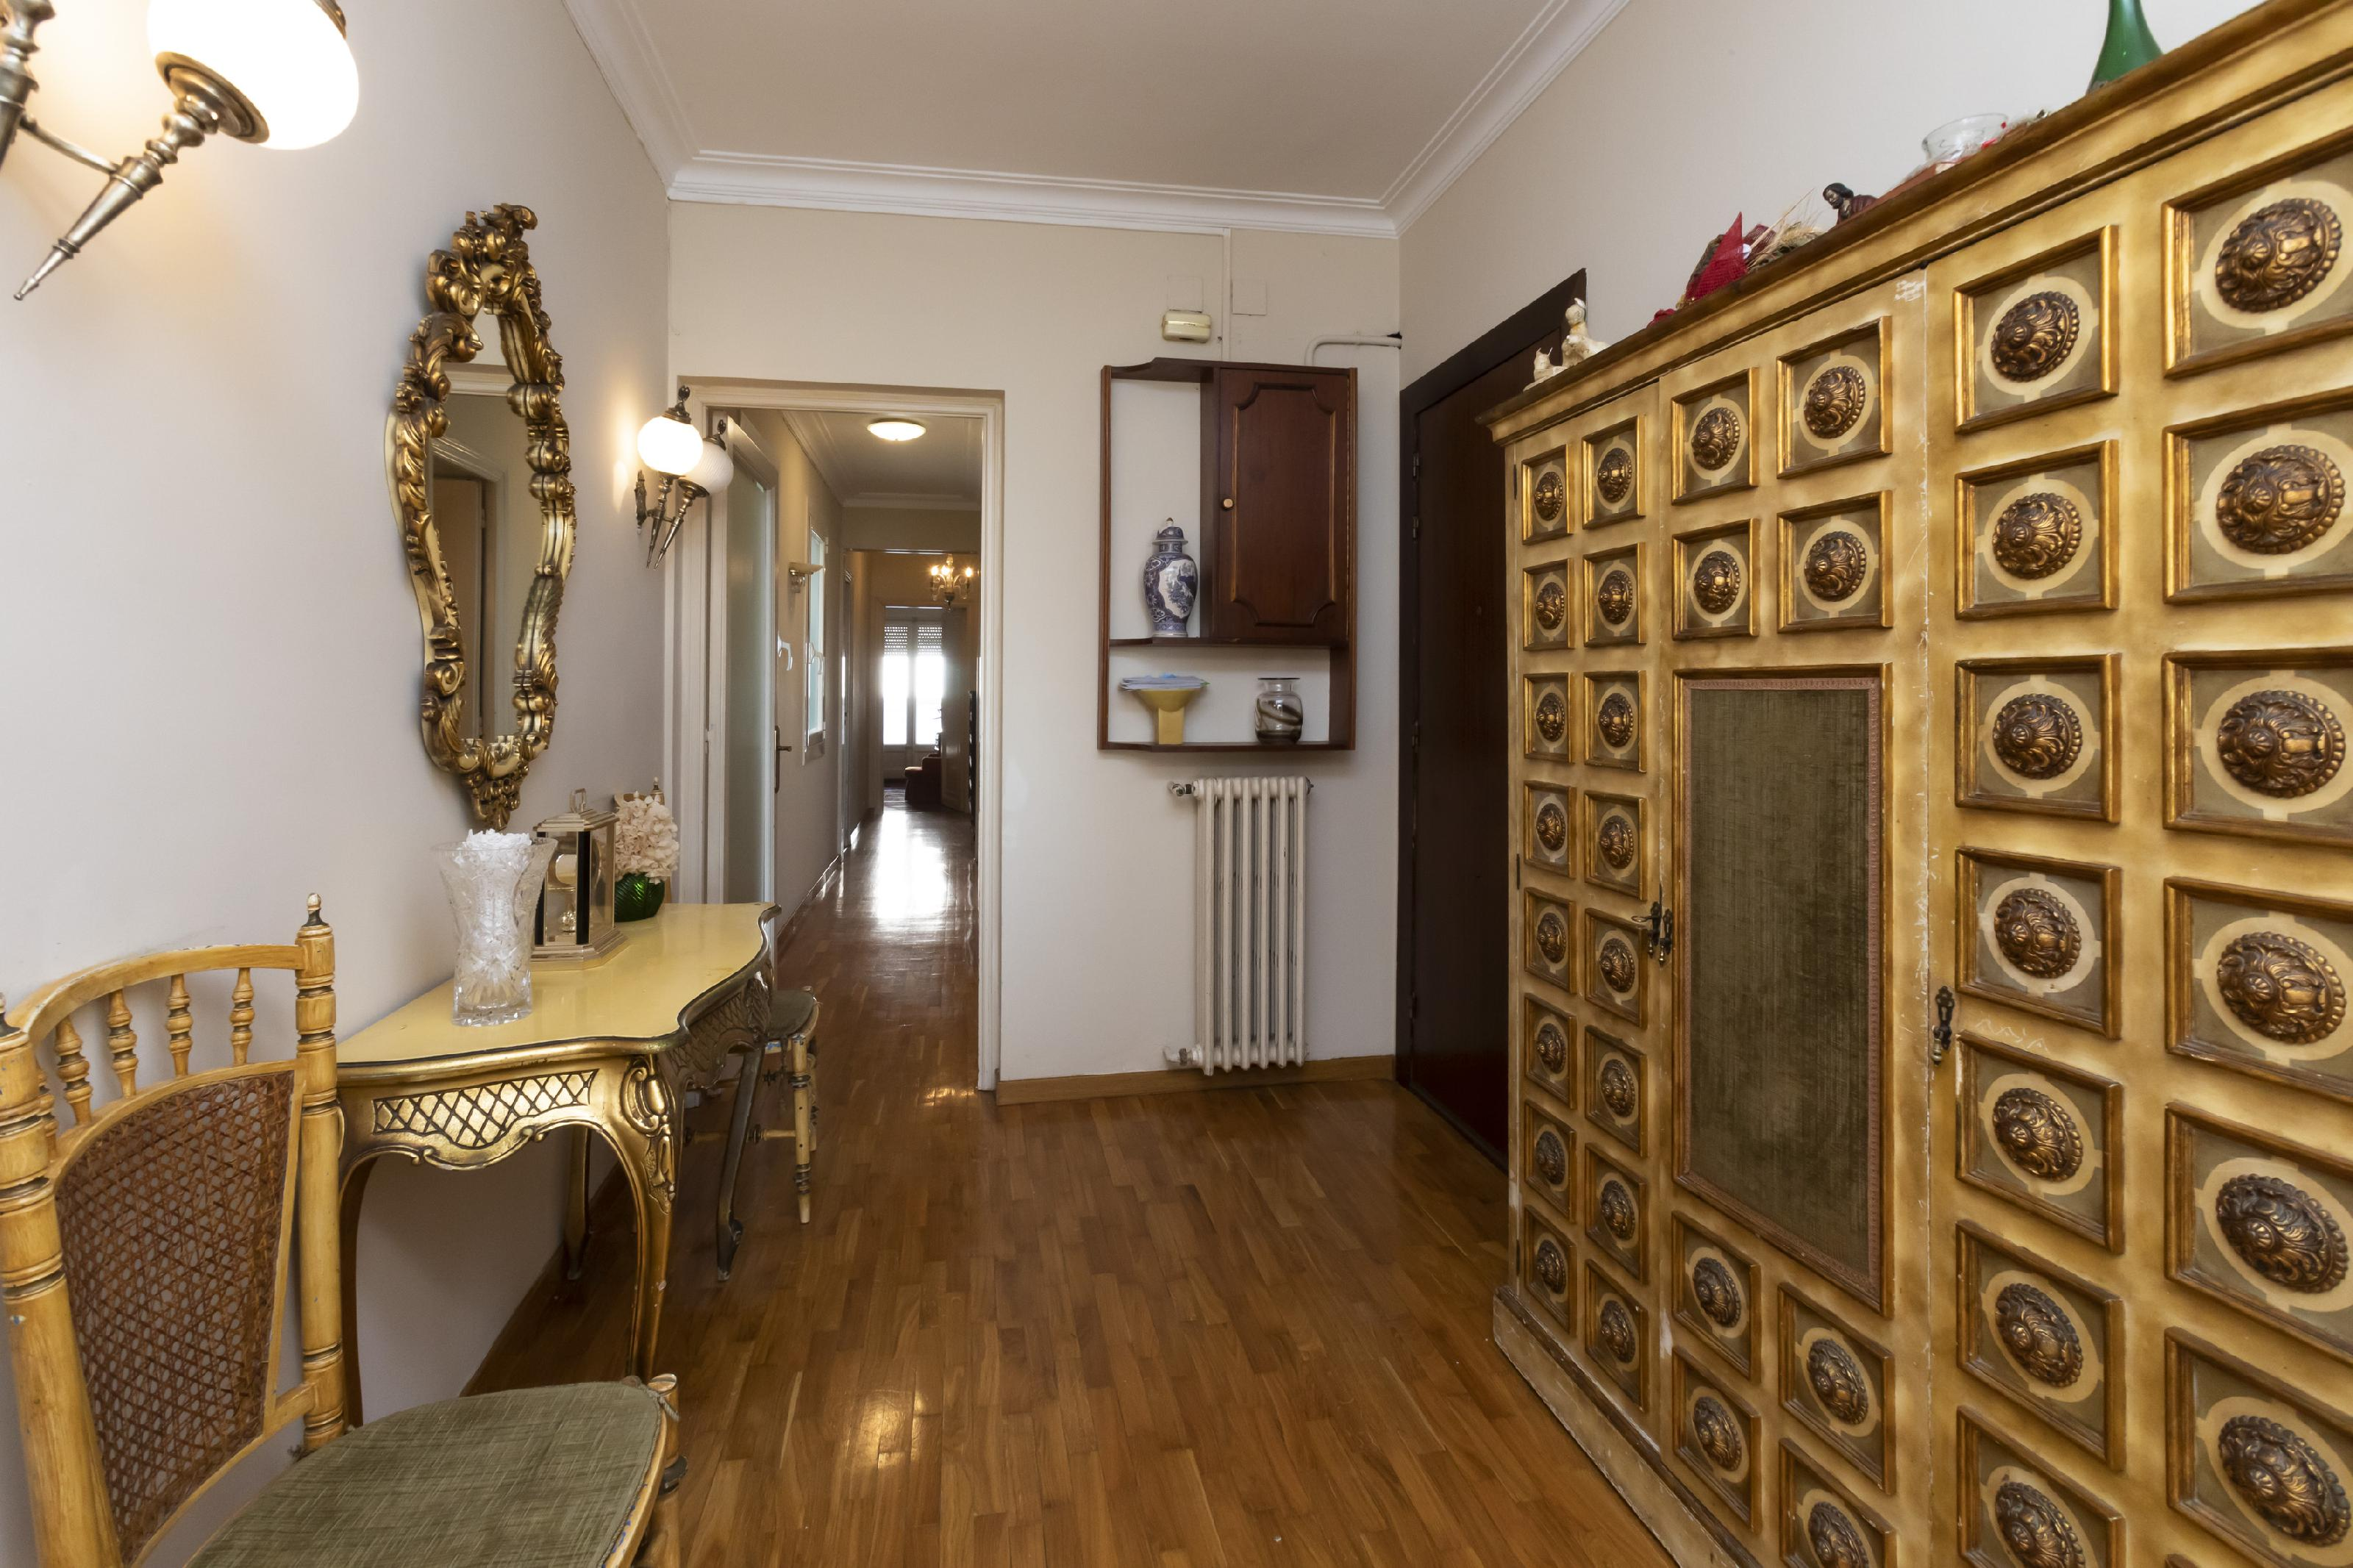 247097 Flat for sale in Sarrià-Sant Gervasi, Sant Gervasi-Galvany 10